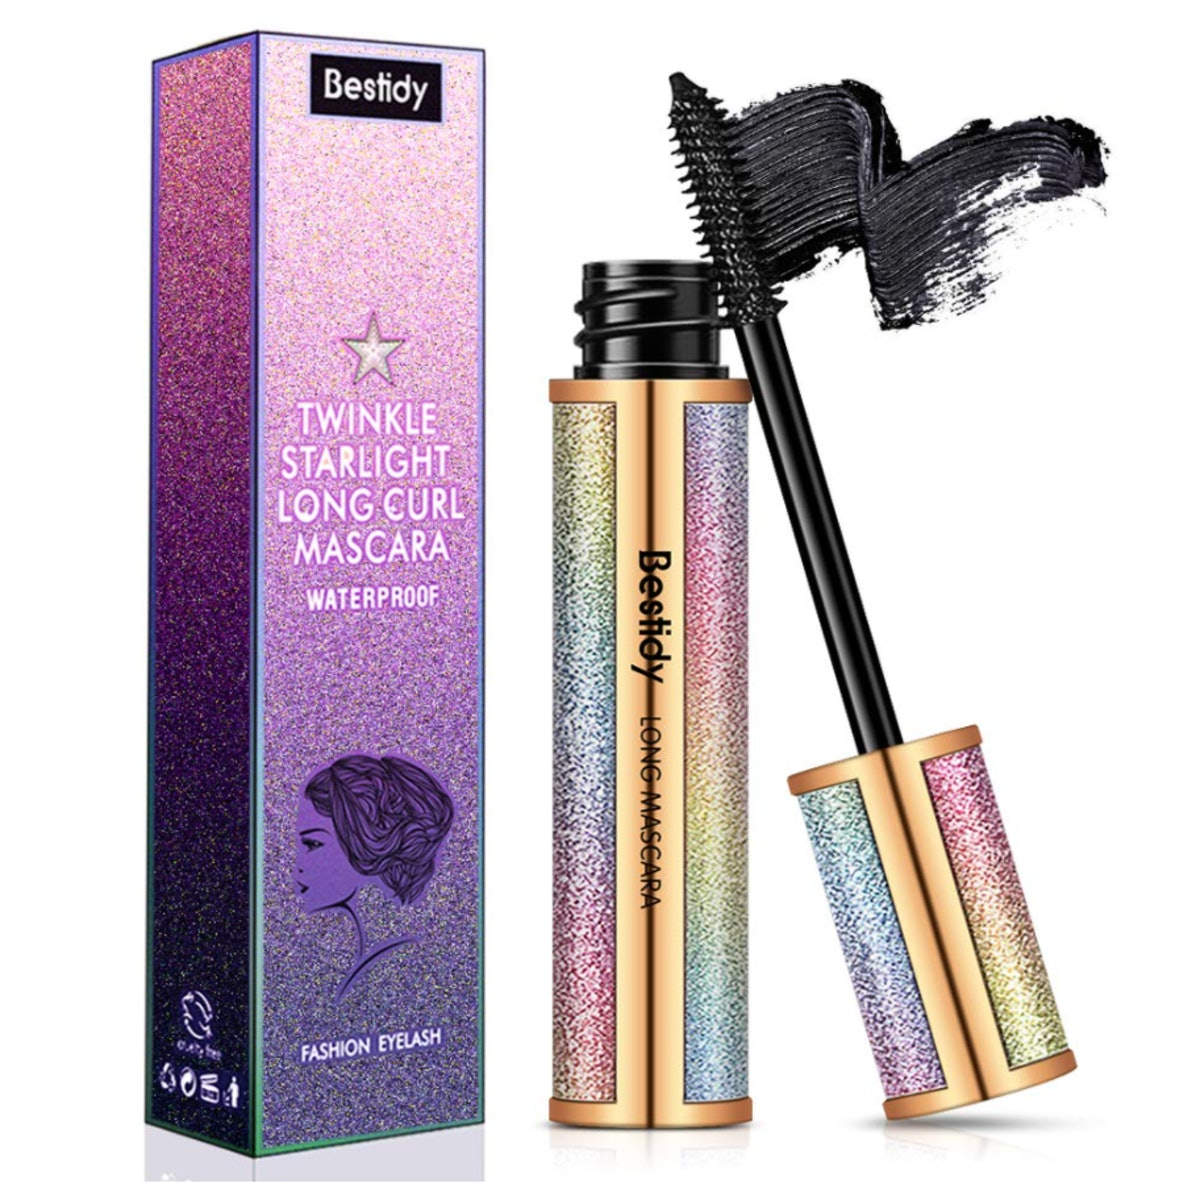 Bestidy Silk Fiber Lash Mascara